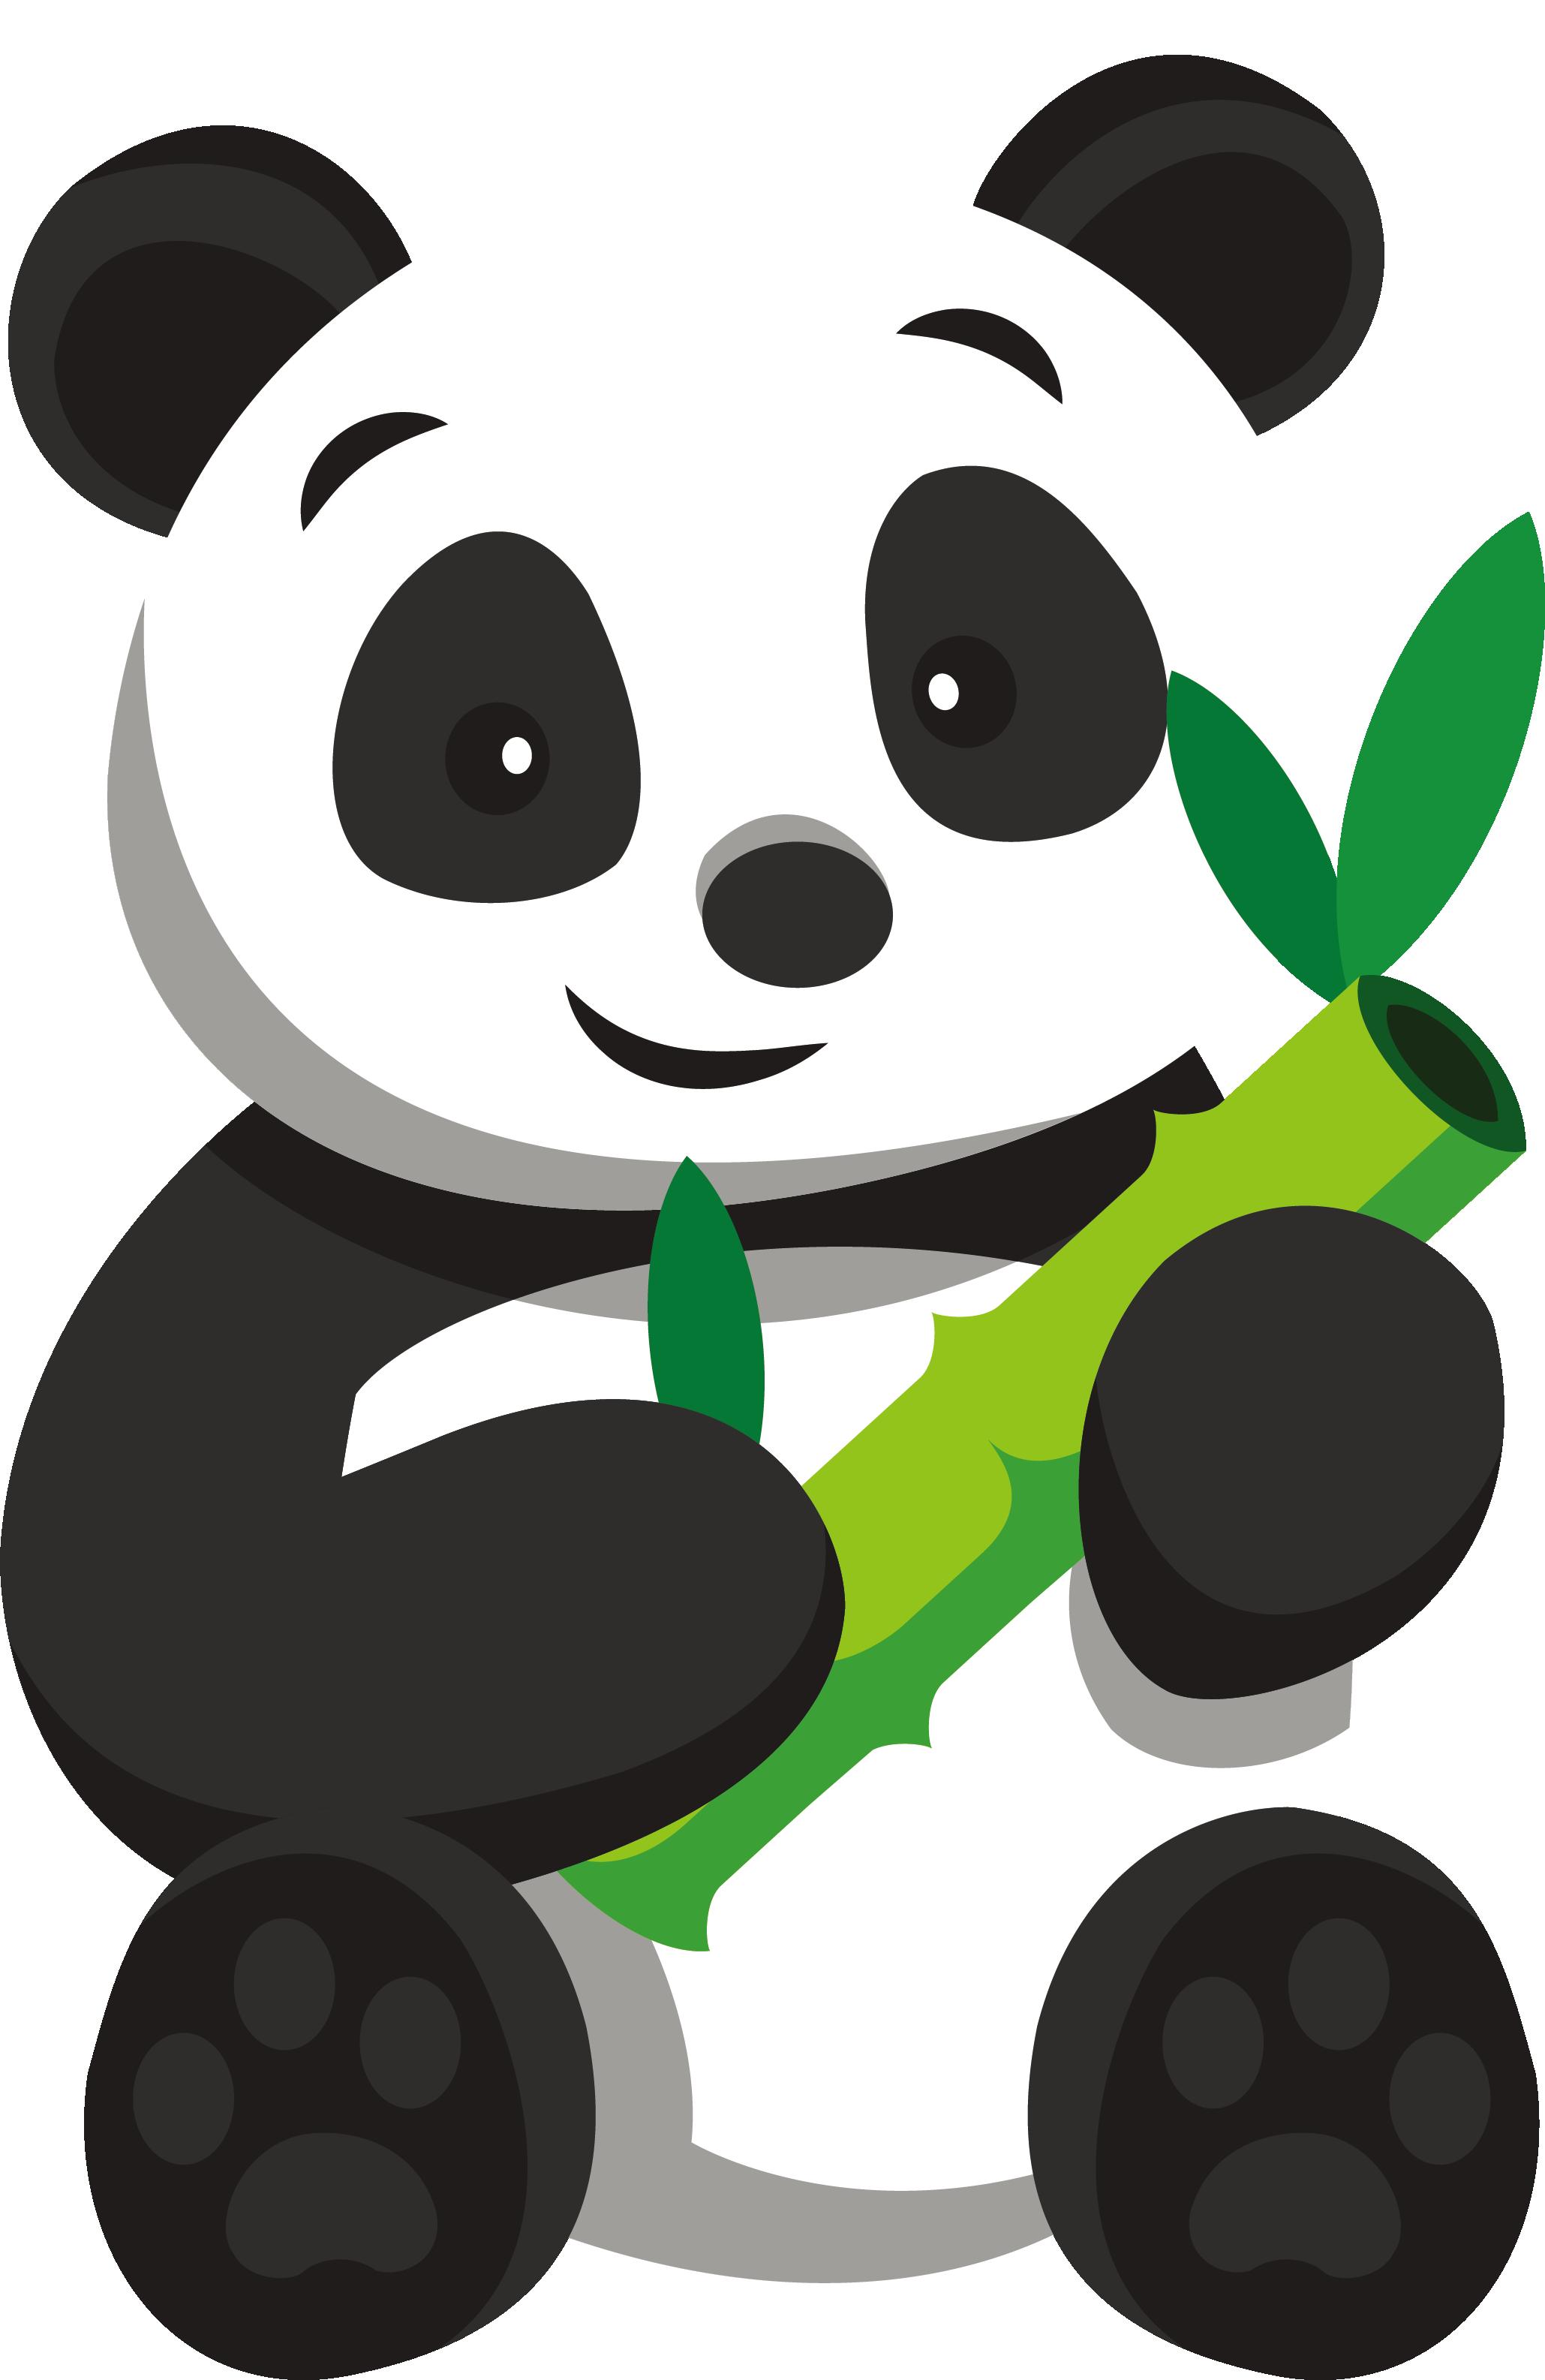 Bamboo house clipart clipart black and white download Giant panda Panda House restaurant Bear Clip art - Bamboo Panda 2059 ... clipart black and white download